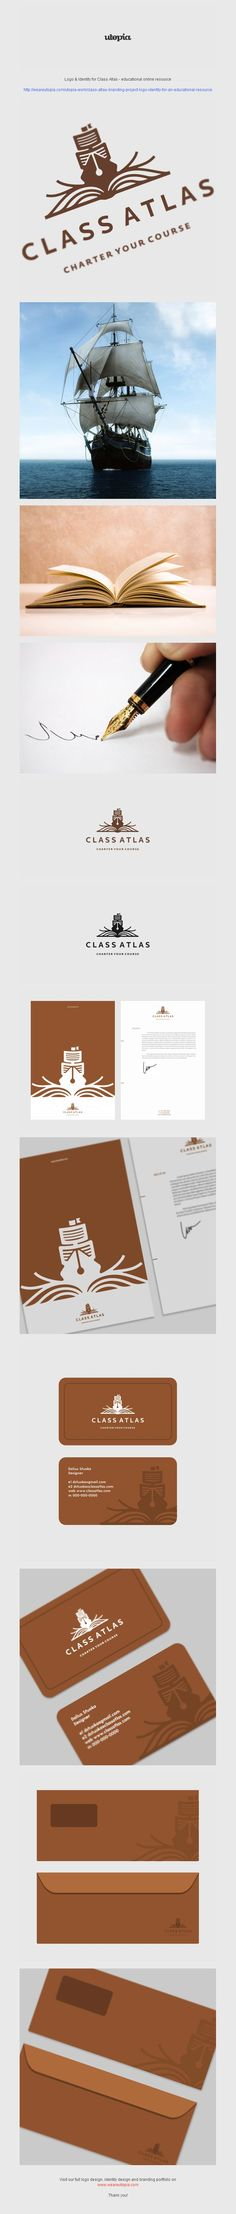 Class Atlas logo and corporate identity design by Utopia Branding Agency